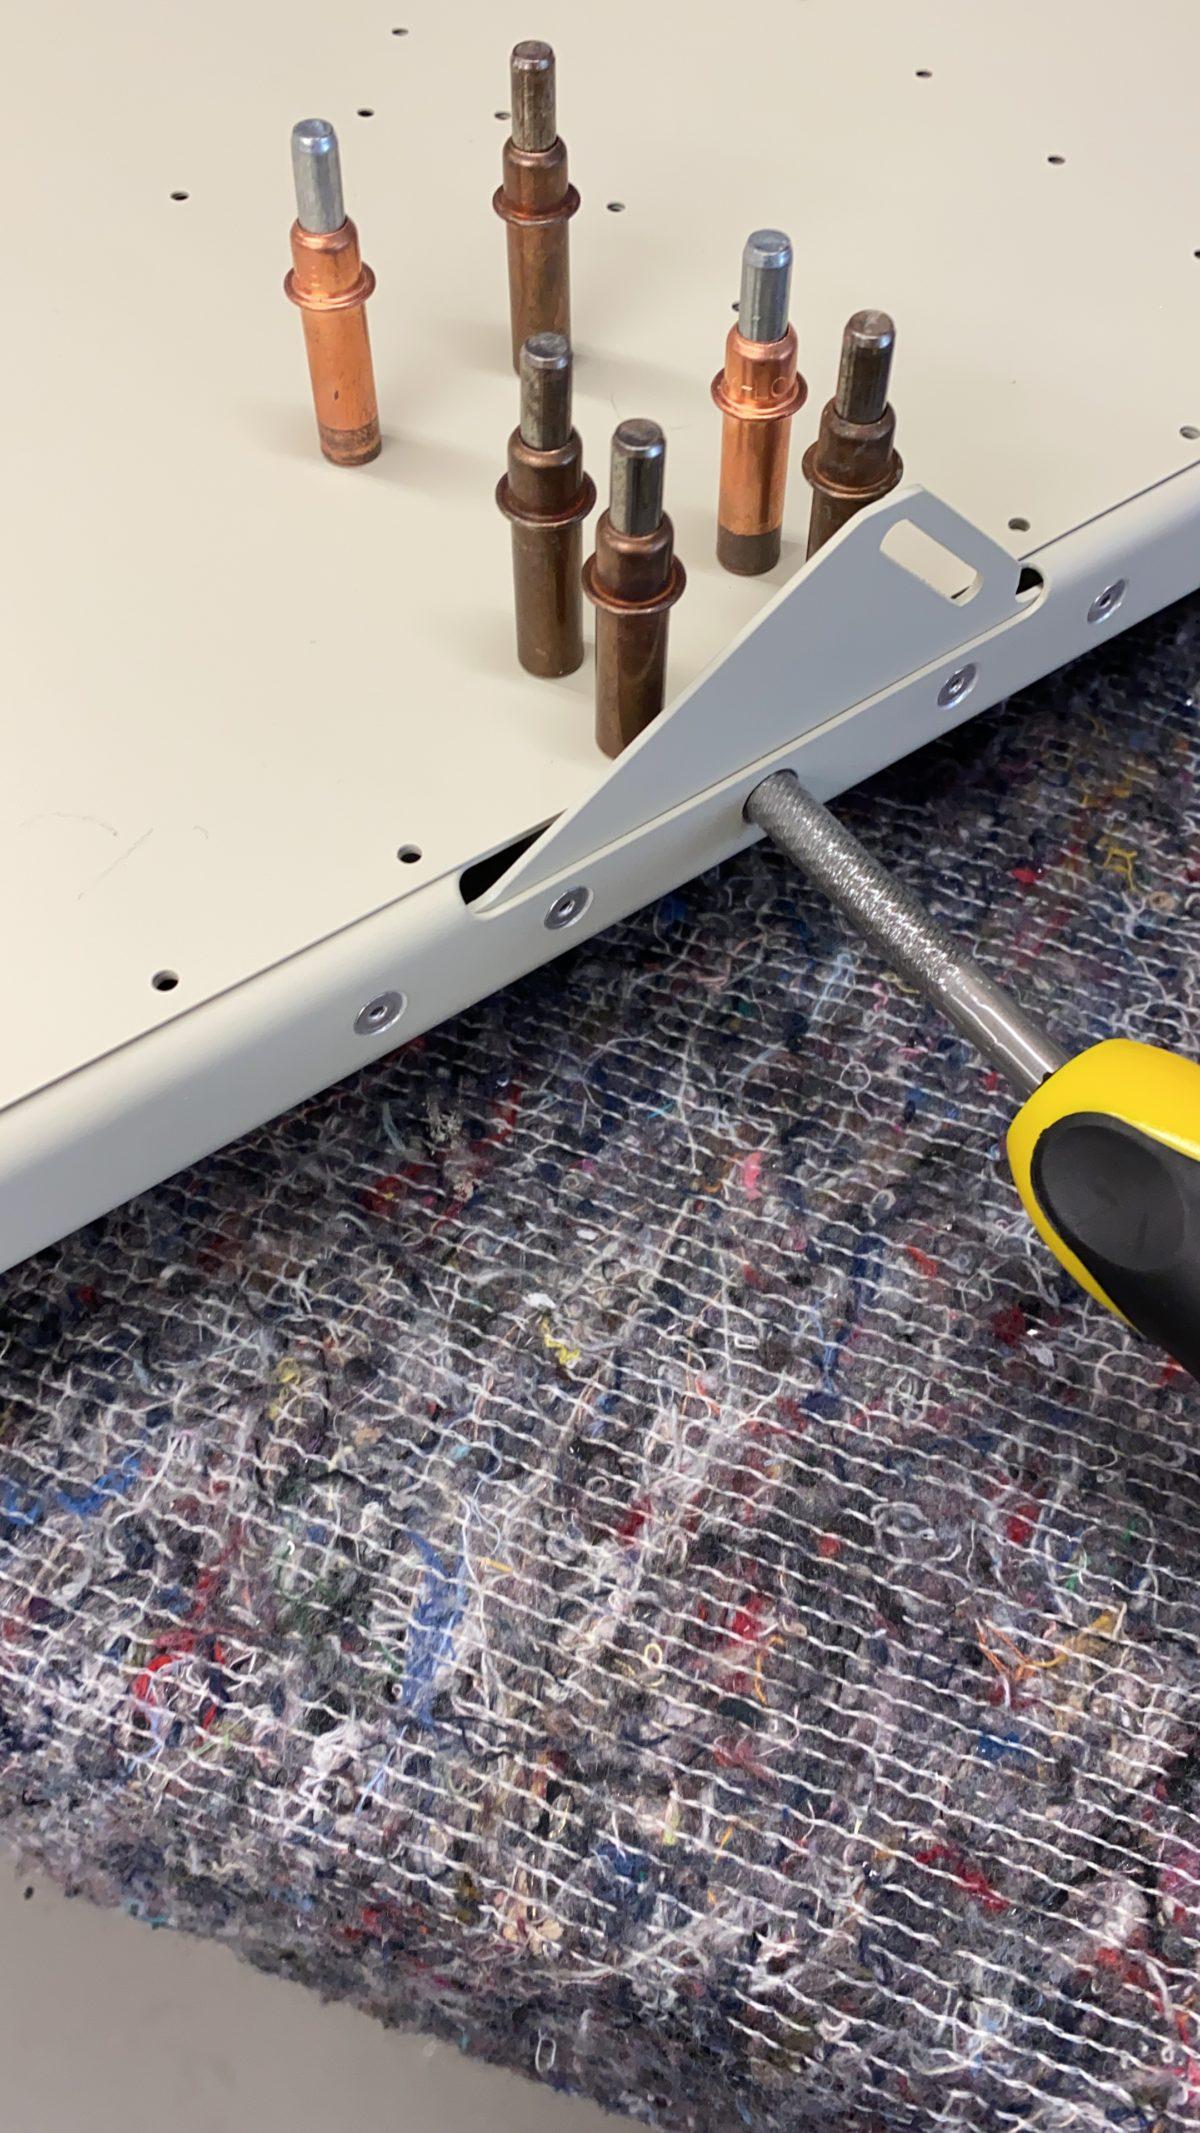 Improve seat locking mechanism